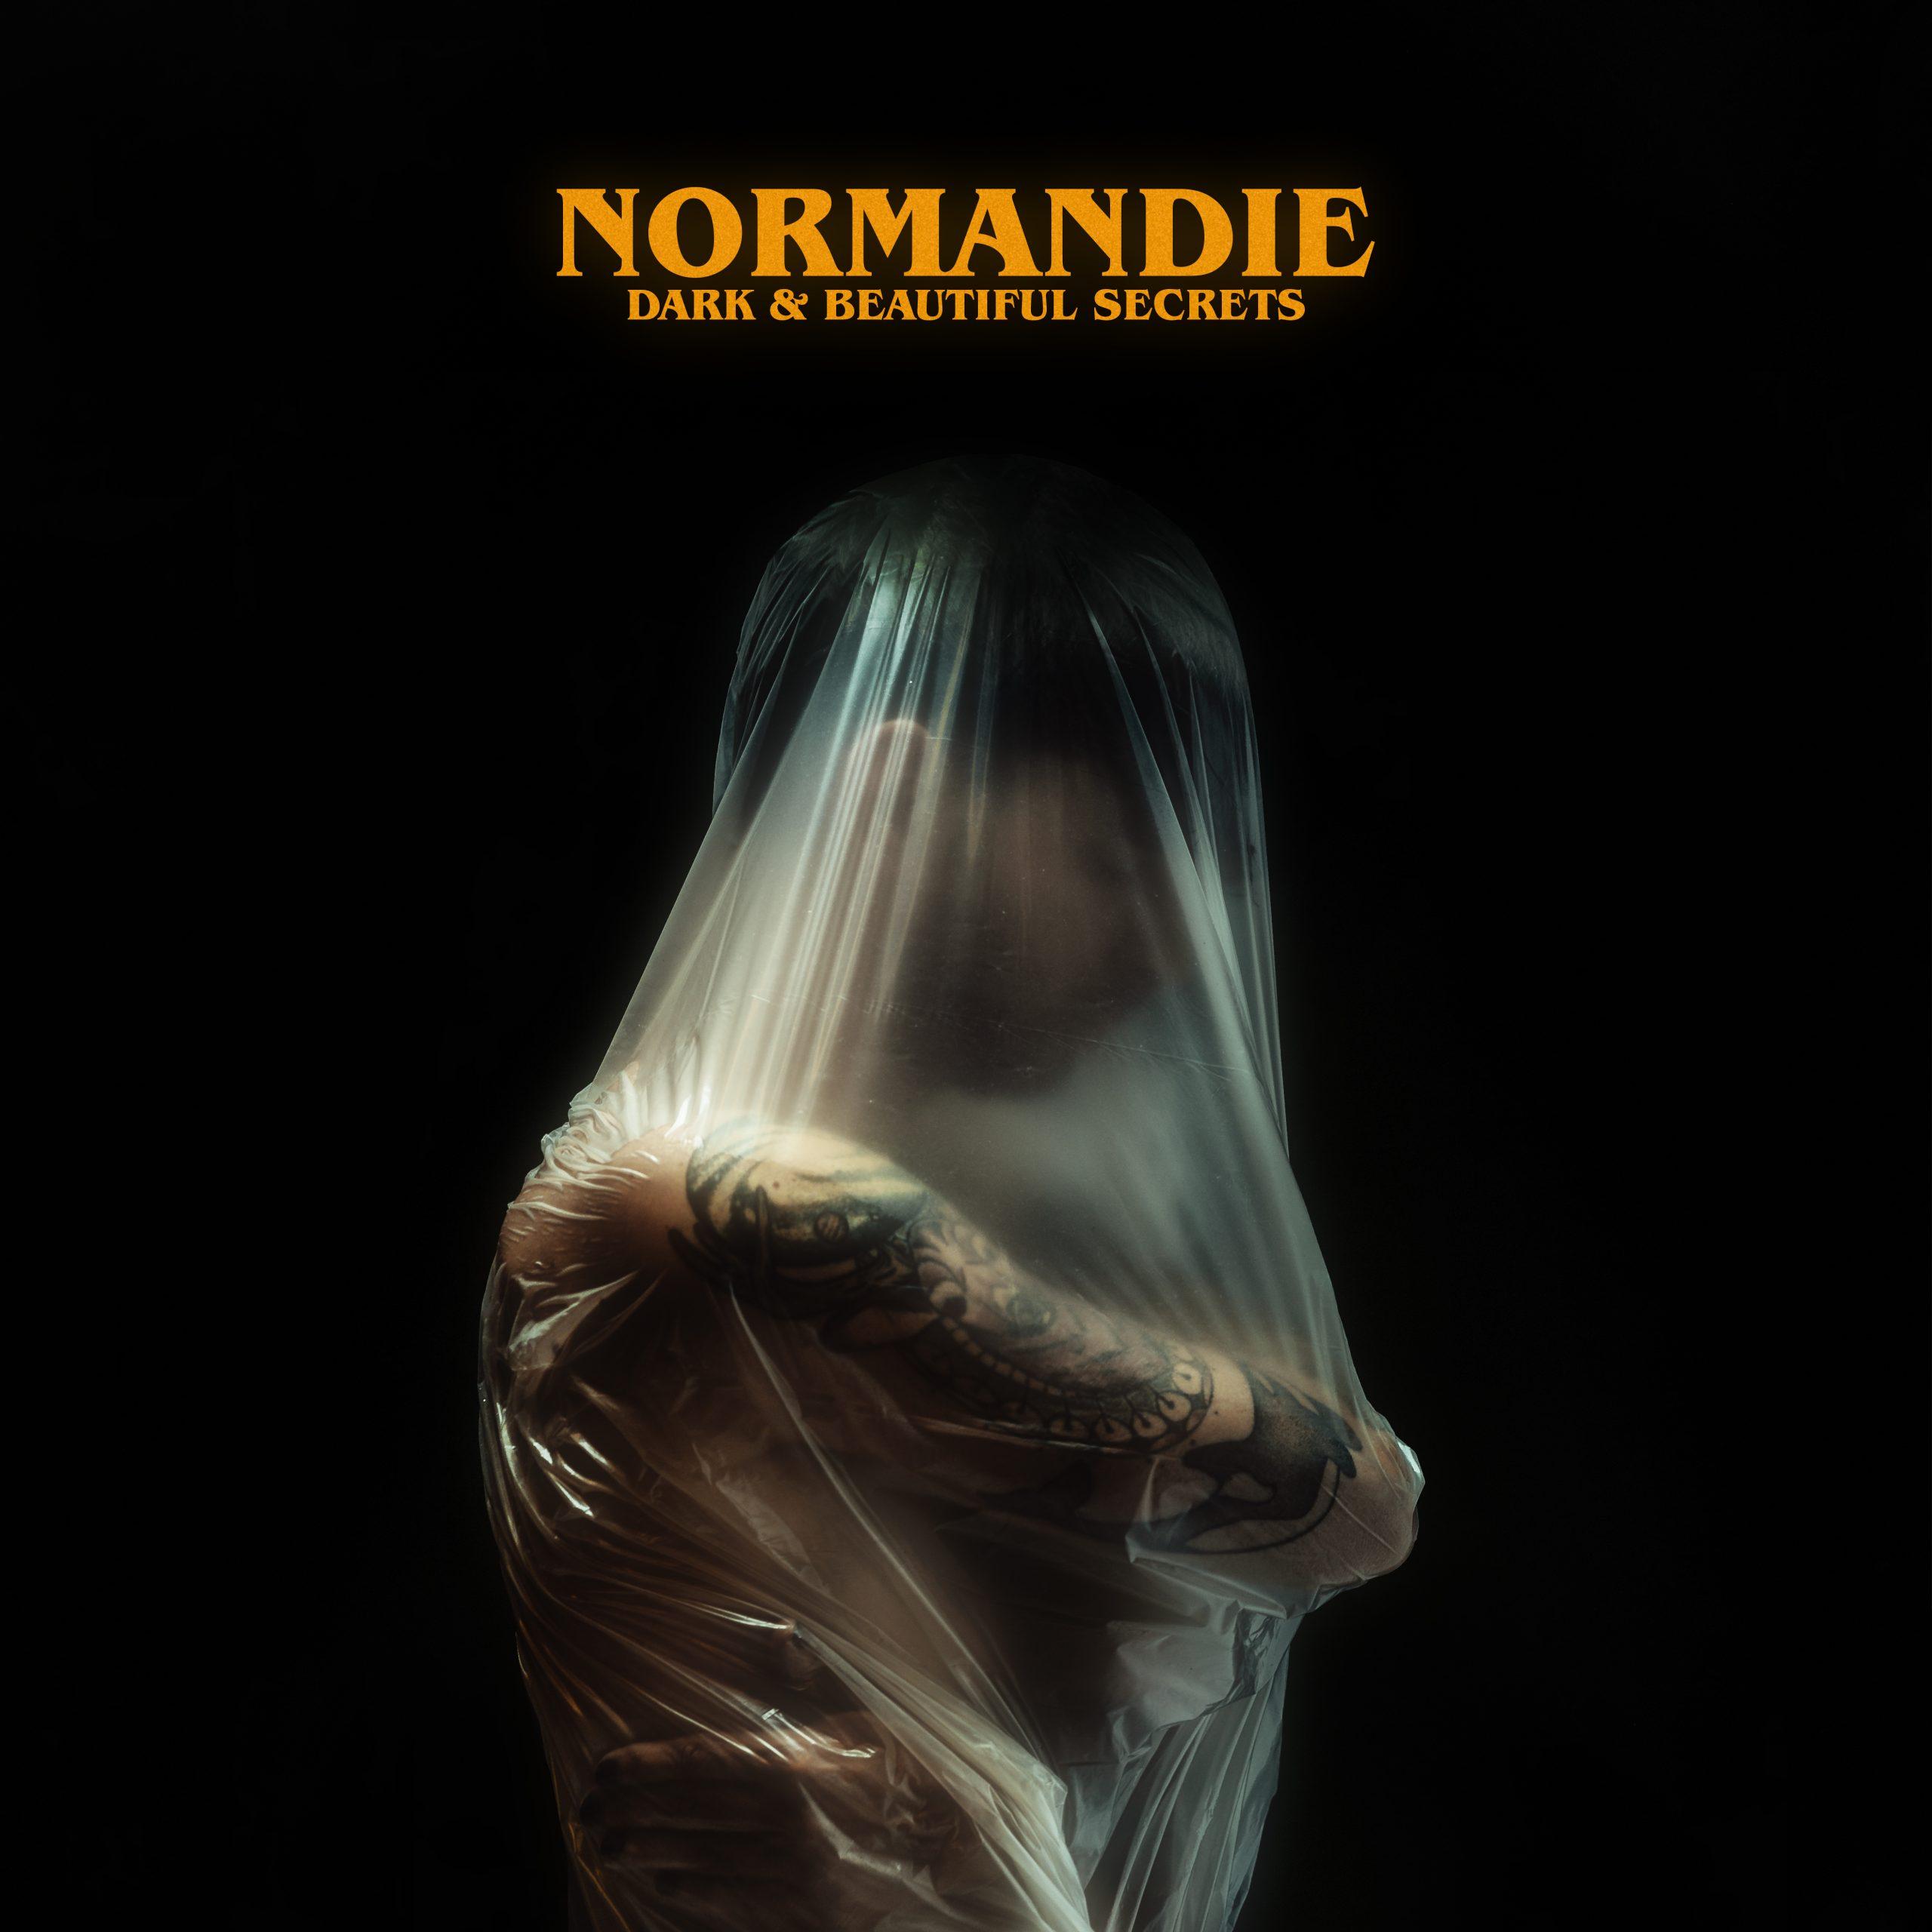 Normandie - Dark & Beautiful Secrets - album Artwork